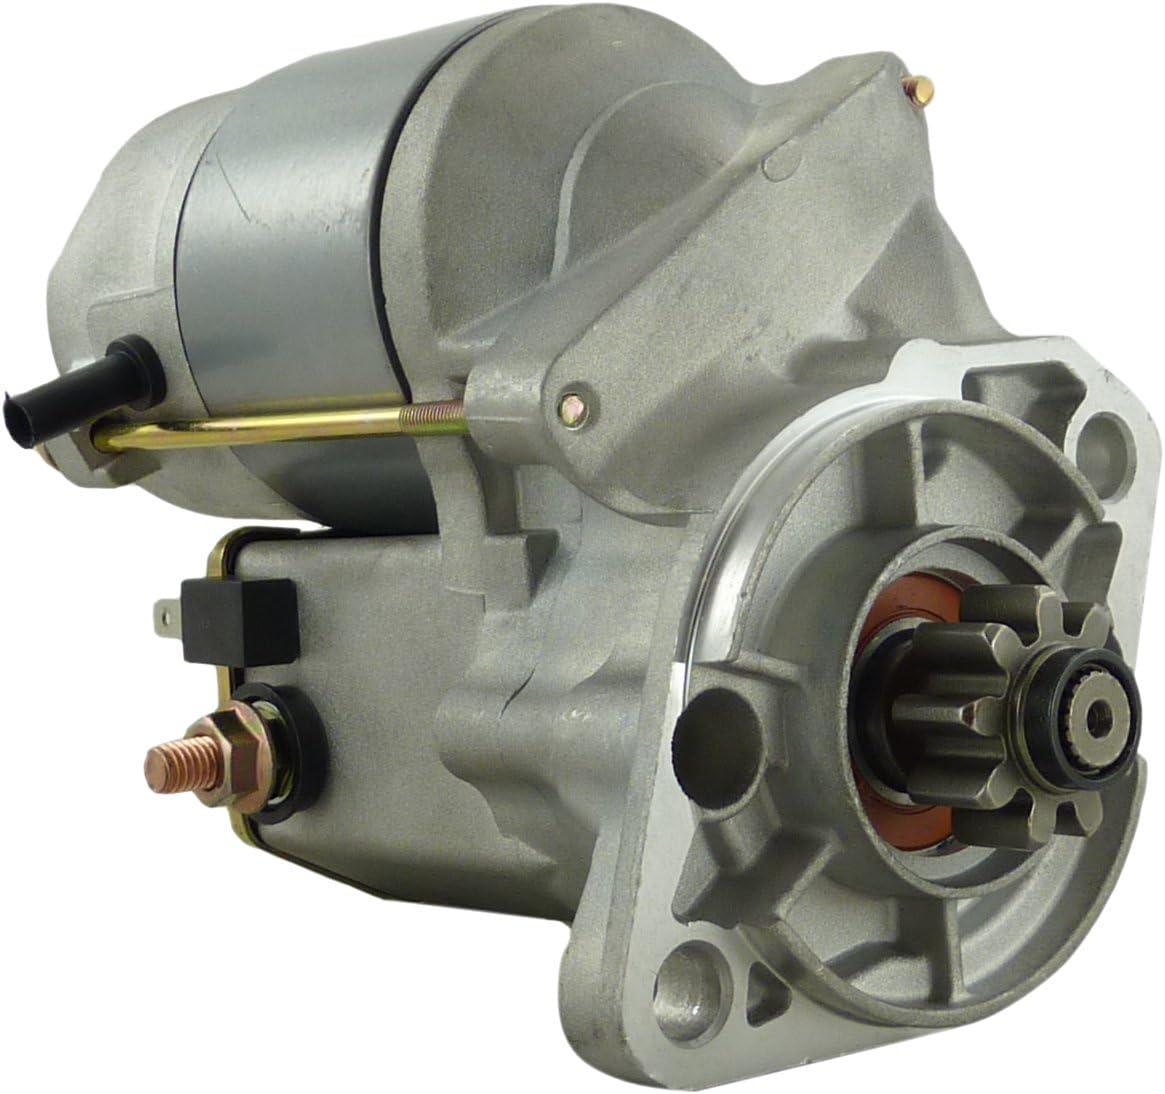 New おすすめ特集 Gear Reduction Starter 高品質 Mach fits Refrigerating Lister-Petter